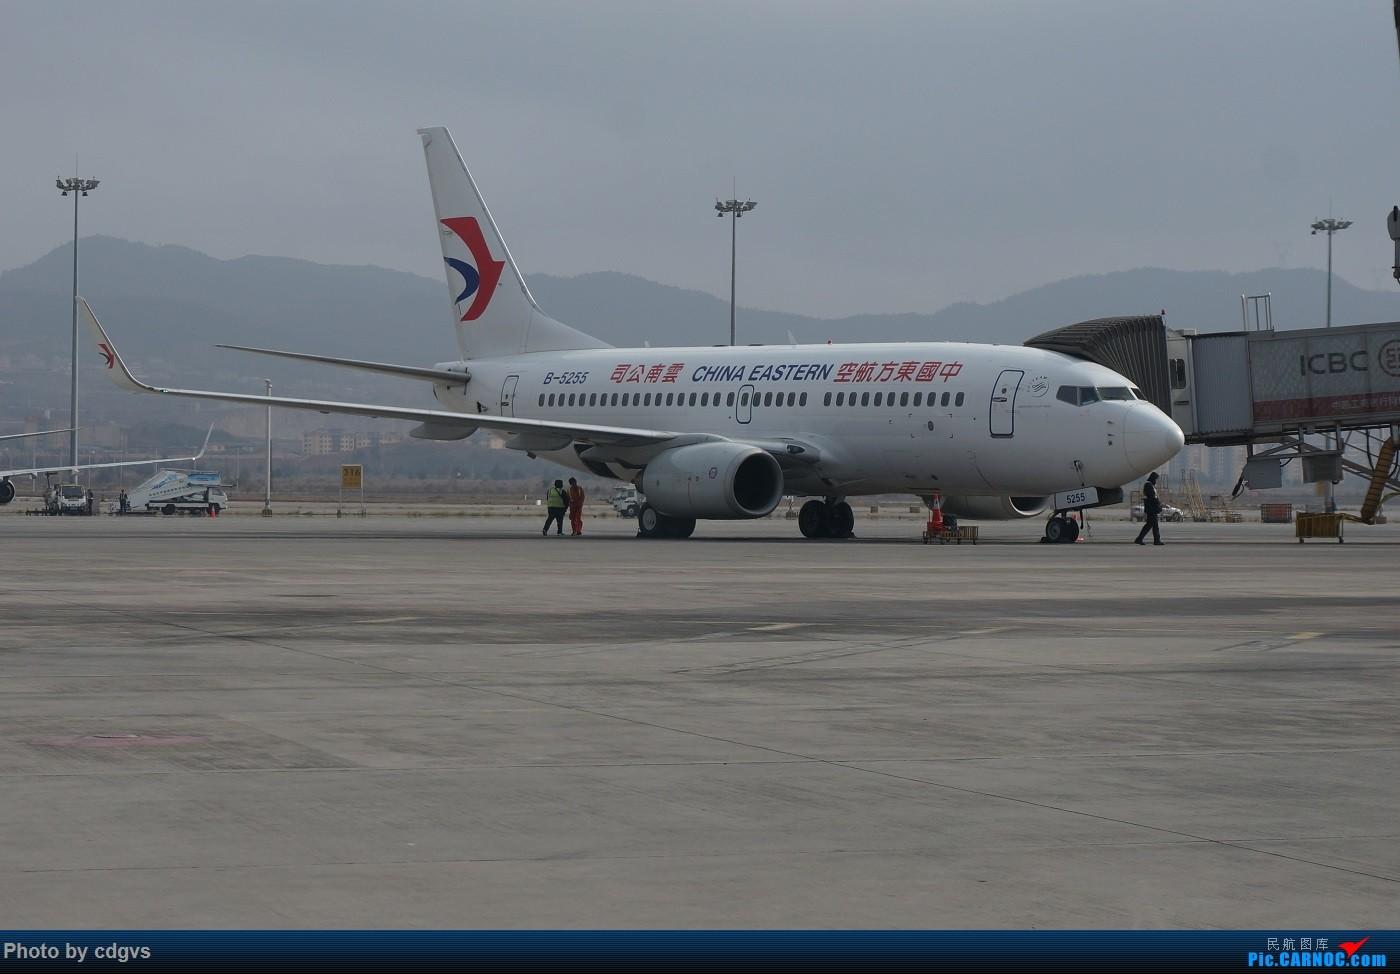 Re:[原创]KMG-LJG-KMG 东航&南航 省内刷航段,飞空客波音两种不同机型 BOEING 737-700 B-5255 中国昆明长水国际机场